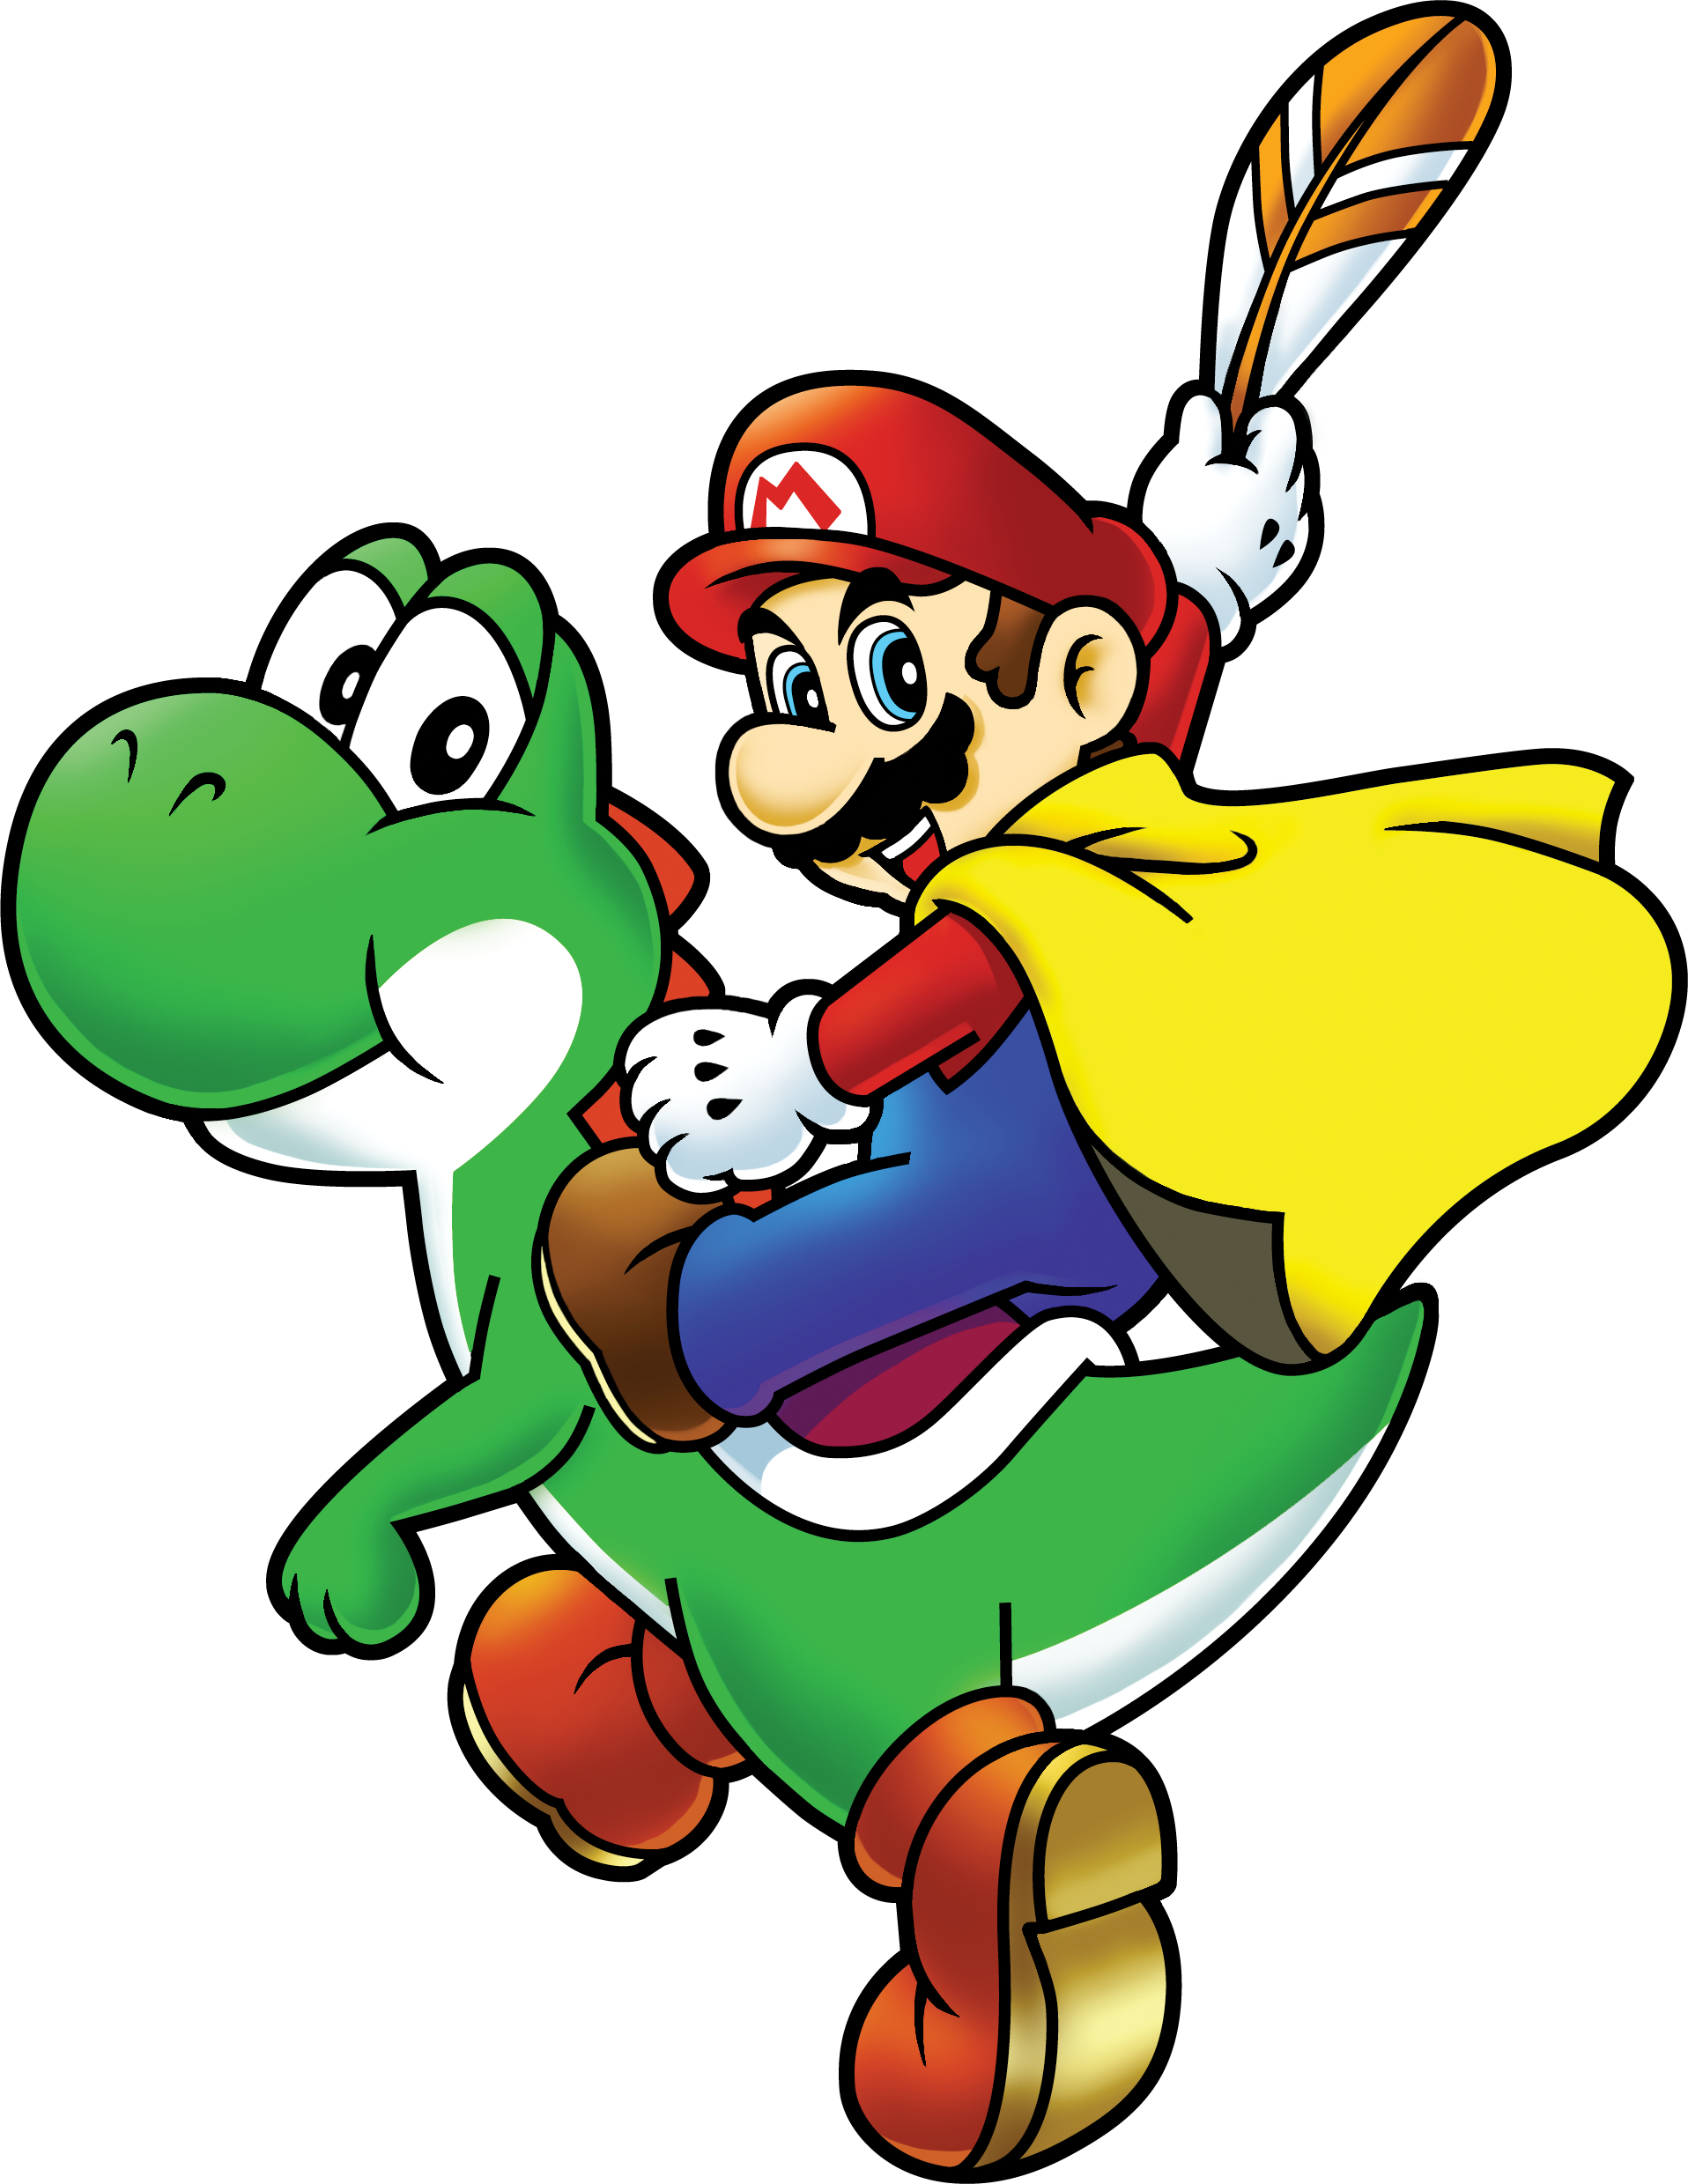 SMW Mario2 20 Reasons Why Super Mario World Has Aged Better Than Super Mario Bros. 3